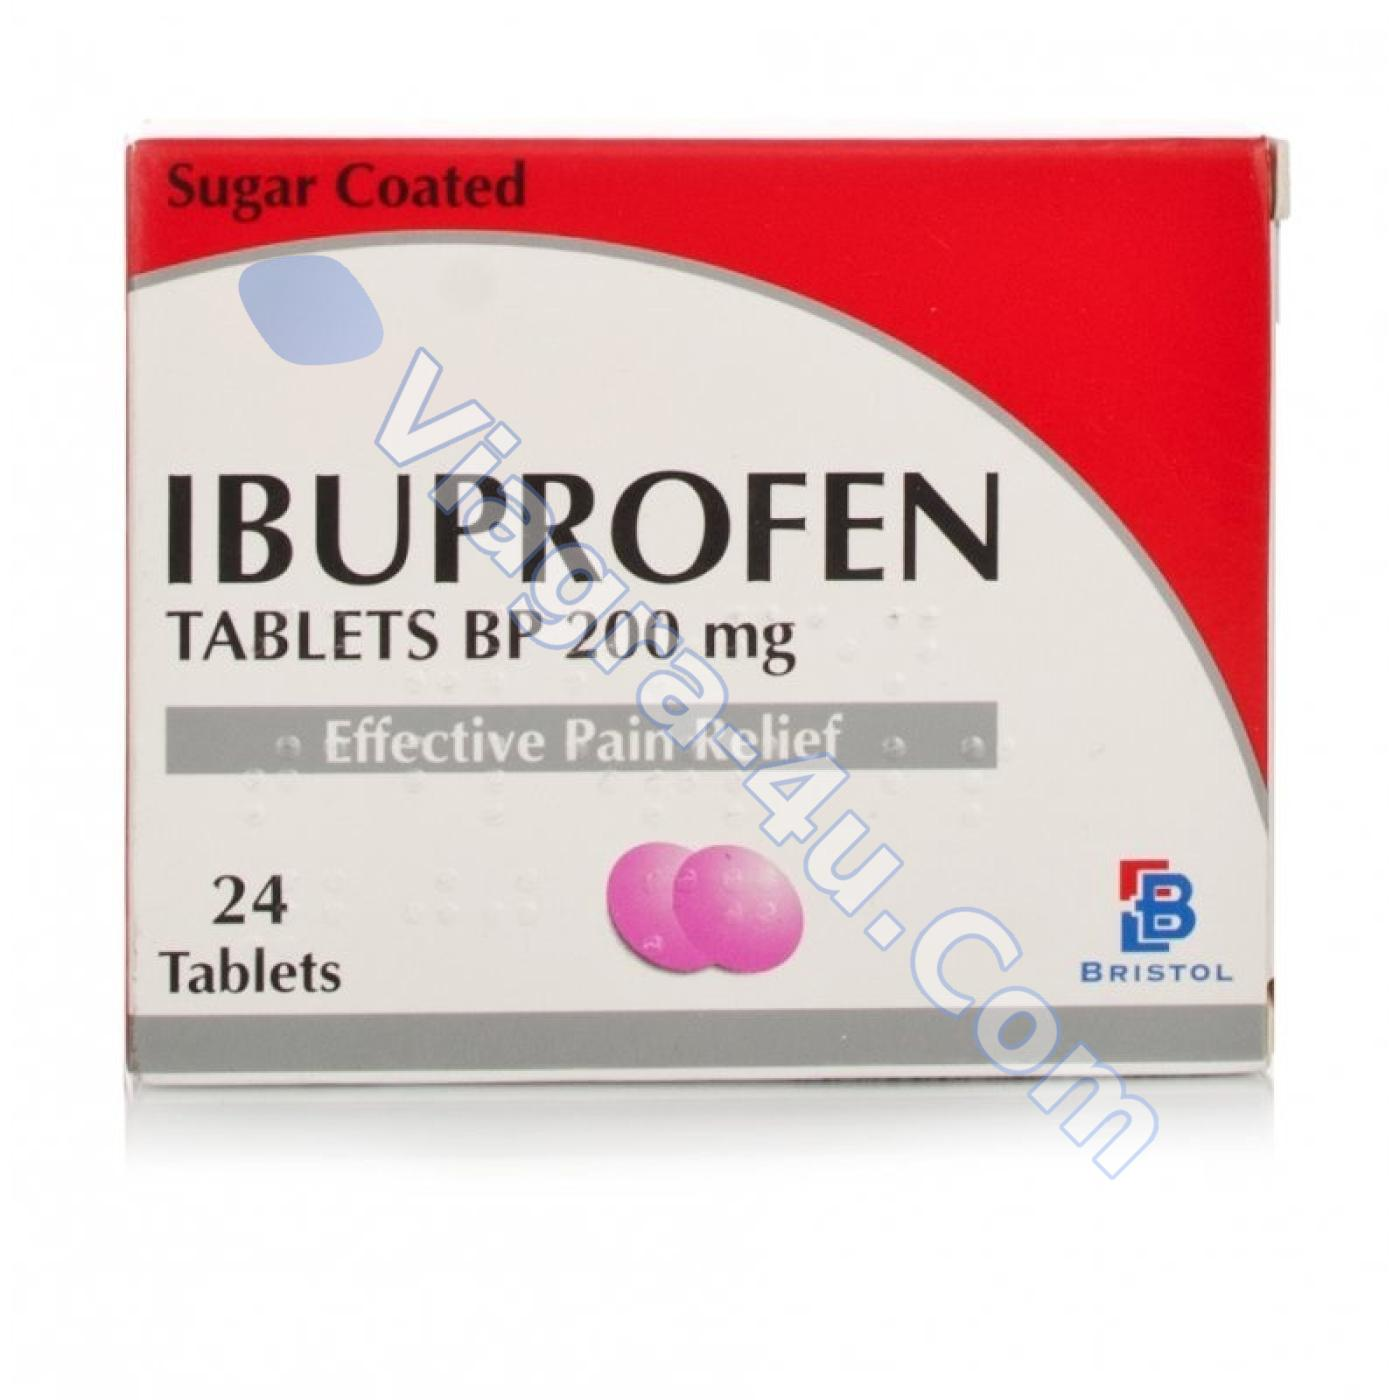 Kaufen Ibuprofen Generika 200mg ohne Rezept